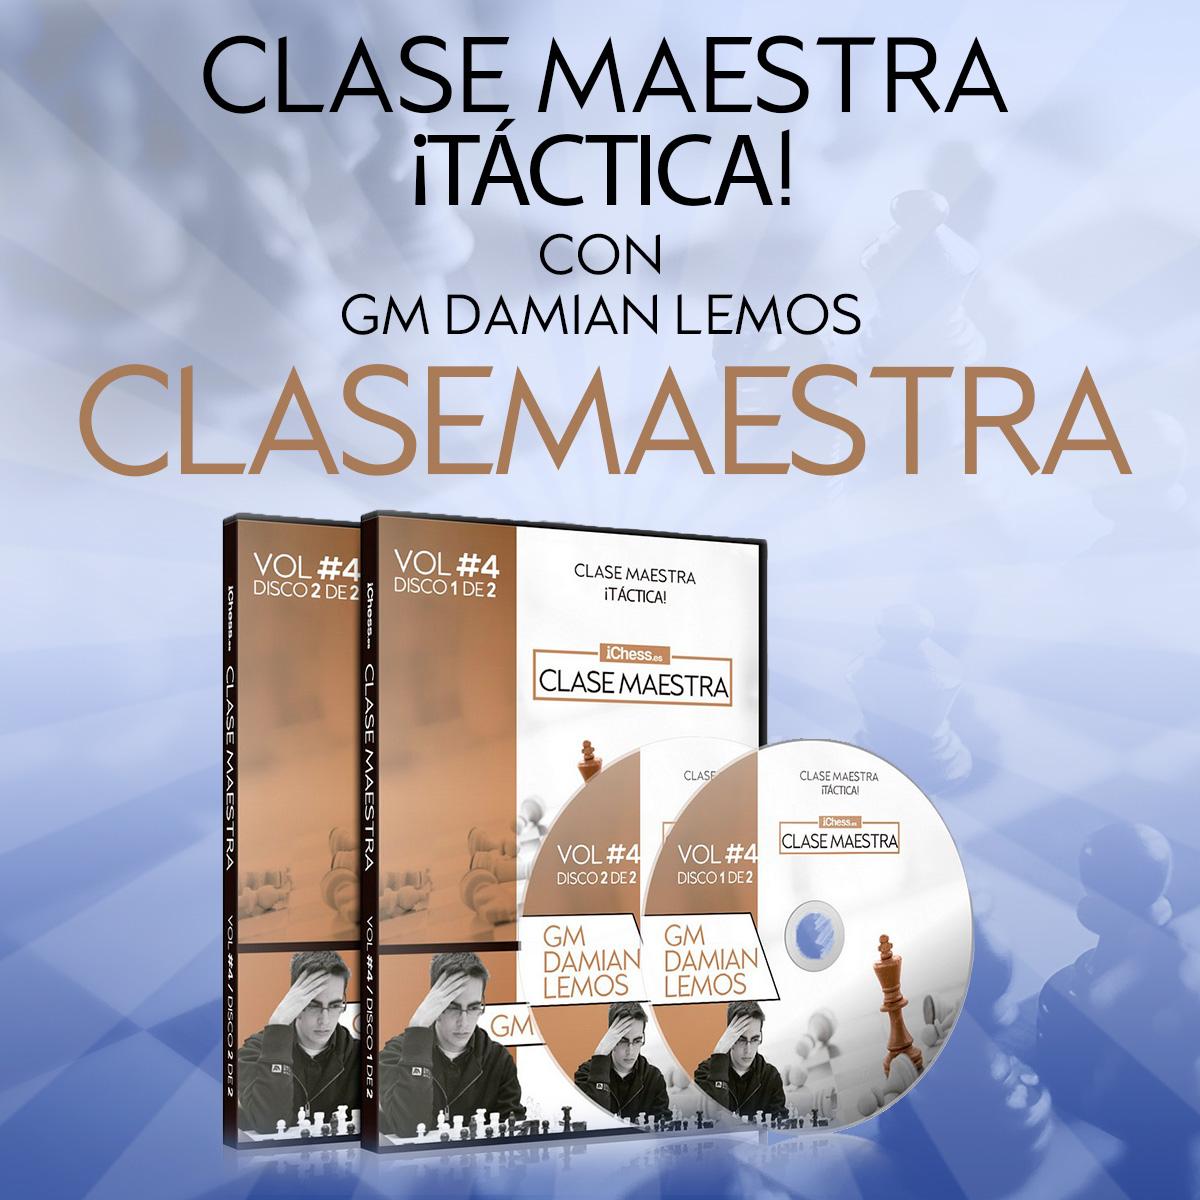 Clase-Maestra-Tactica-Damian-Lemos